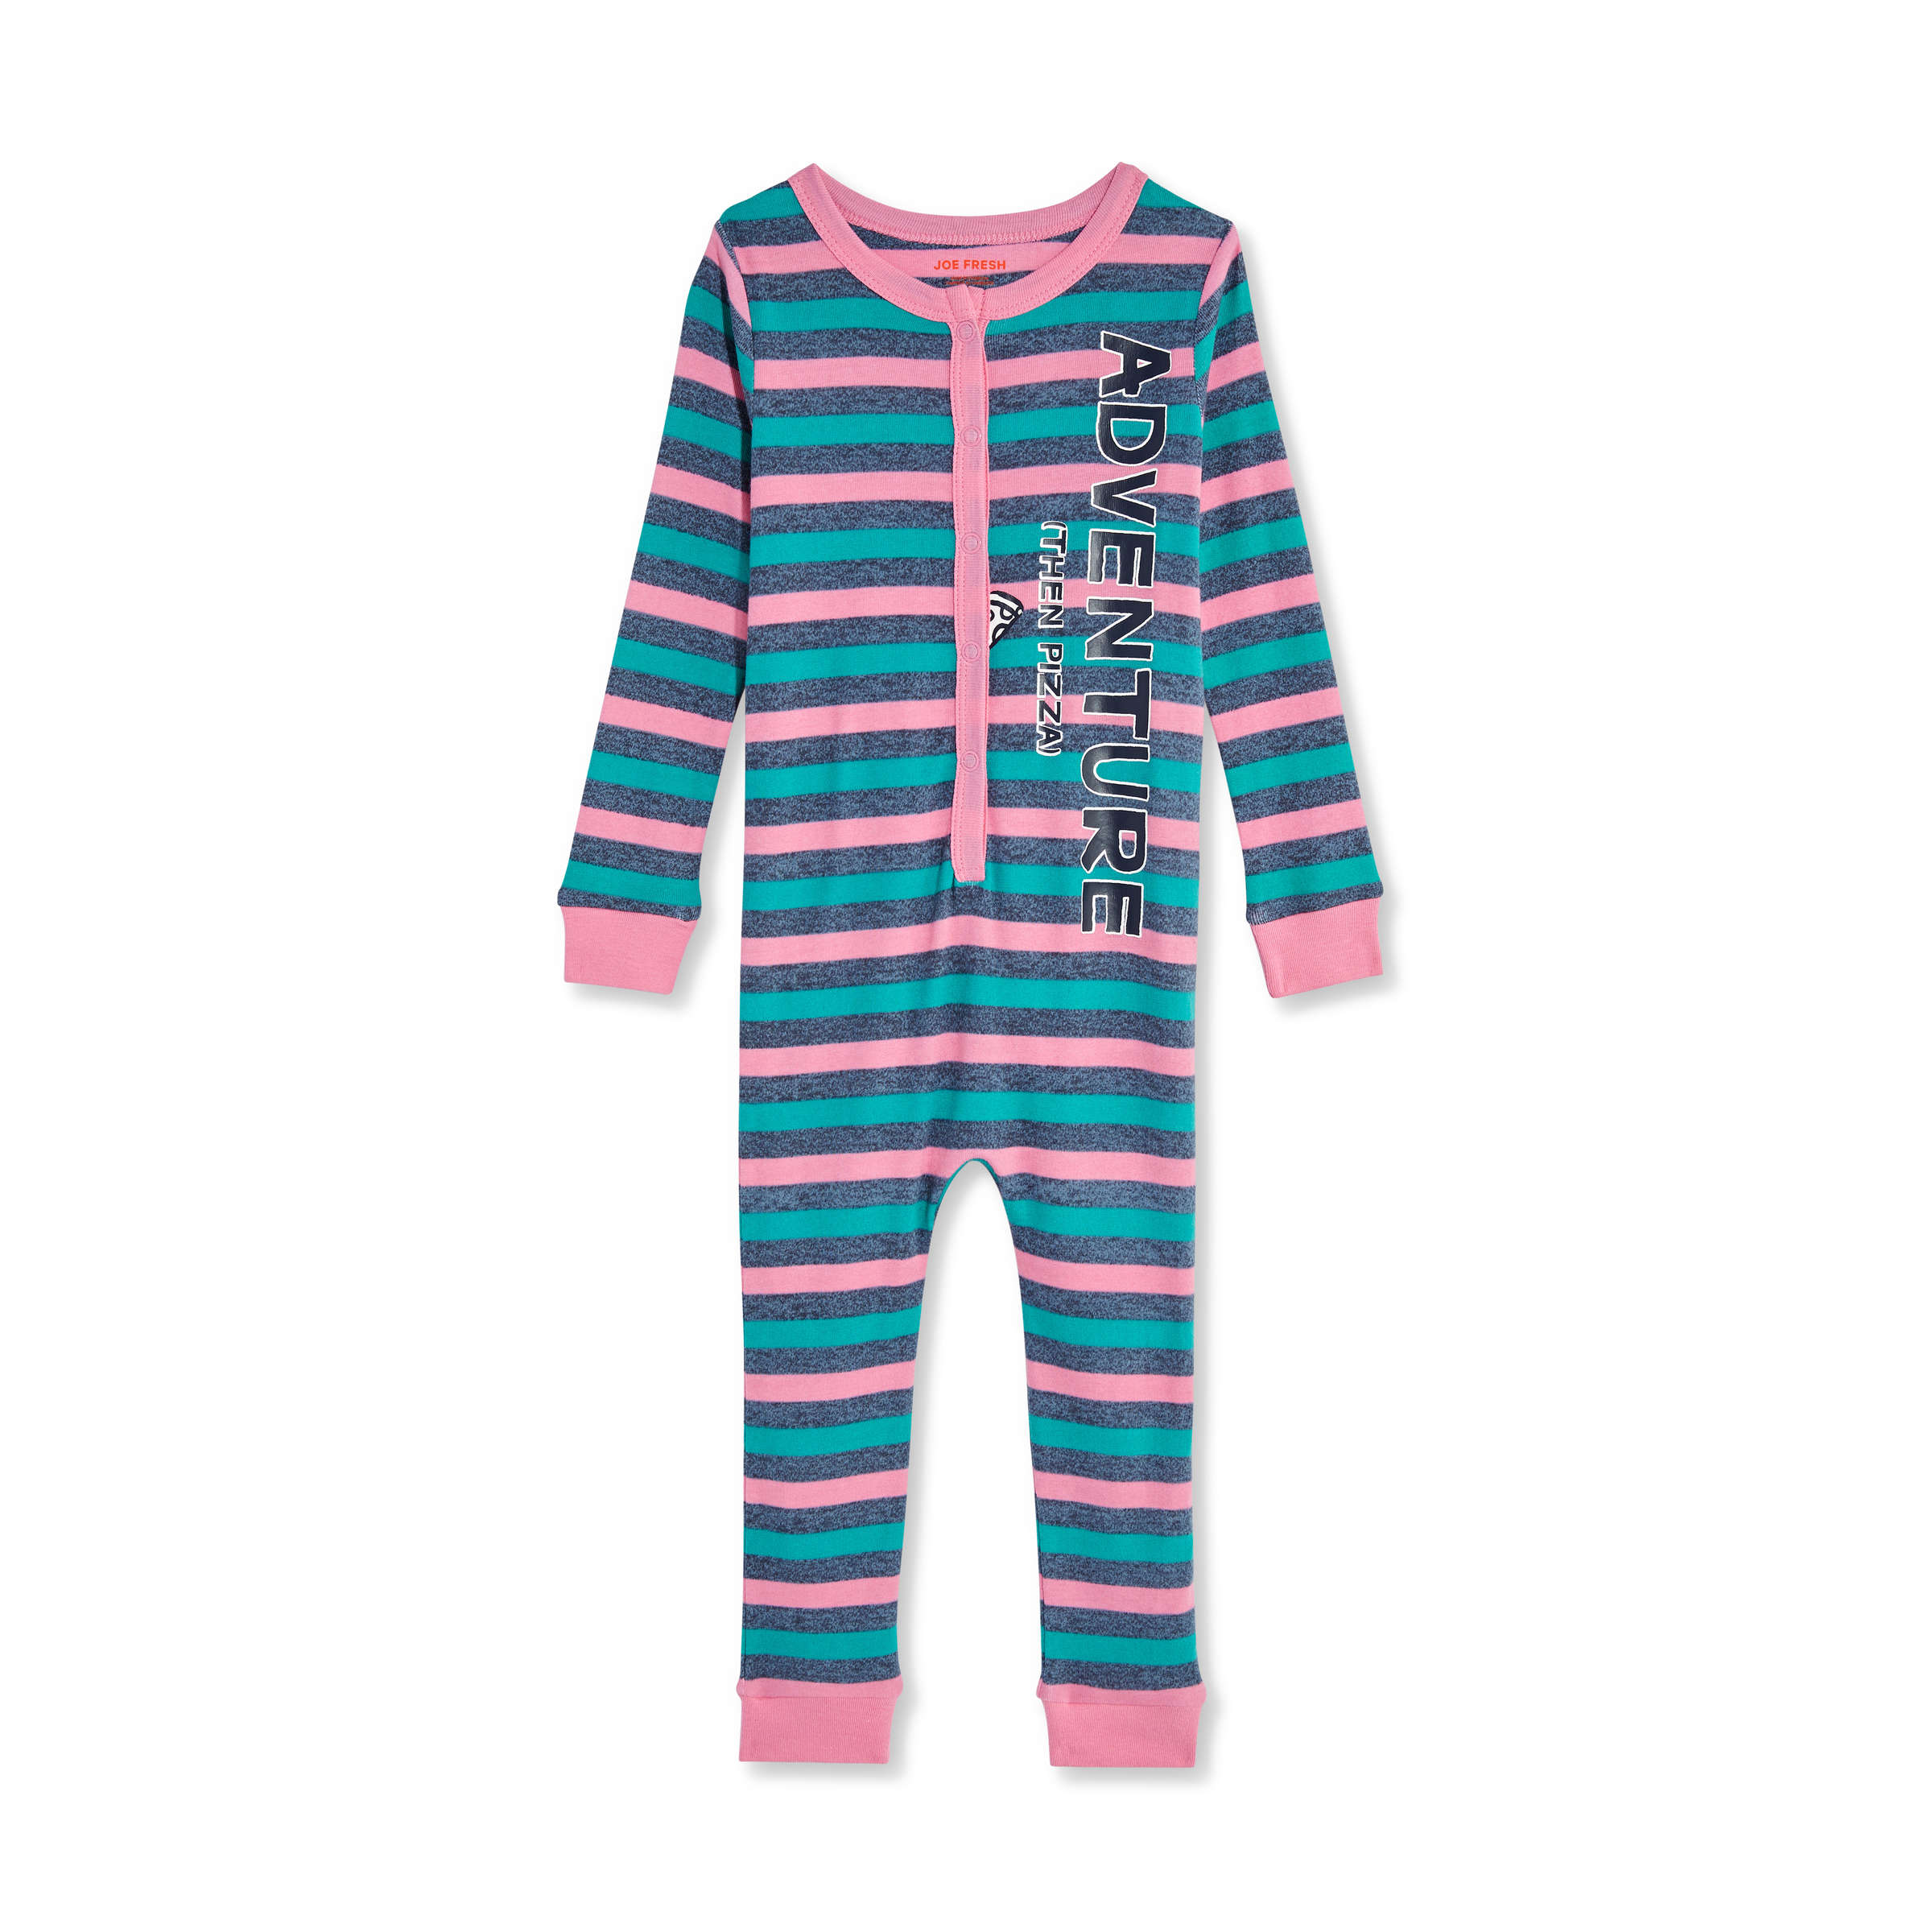 7066392b96c6 Toddler Girls  Long Sleeve Sleeper in Pink from Joe Fresh